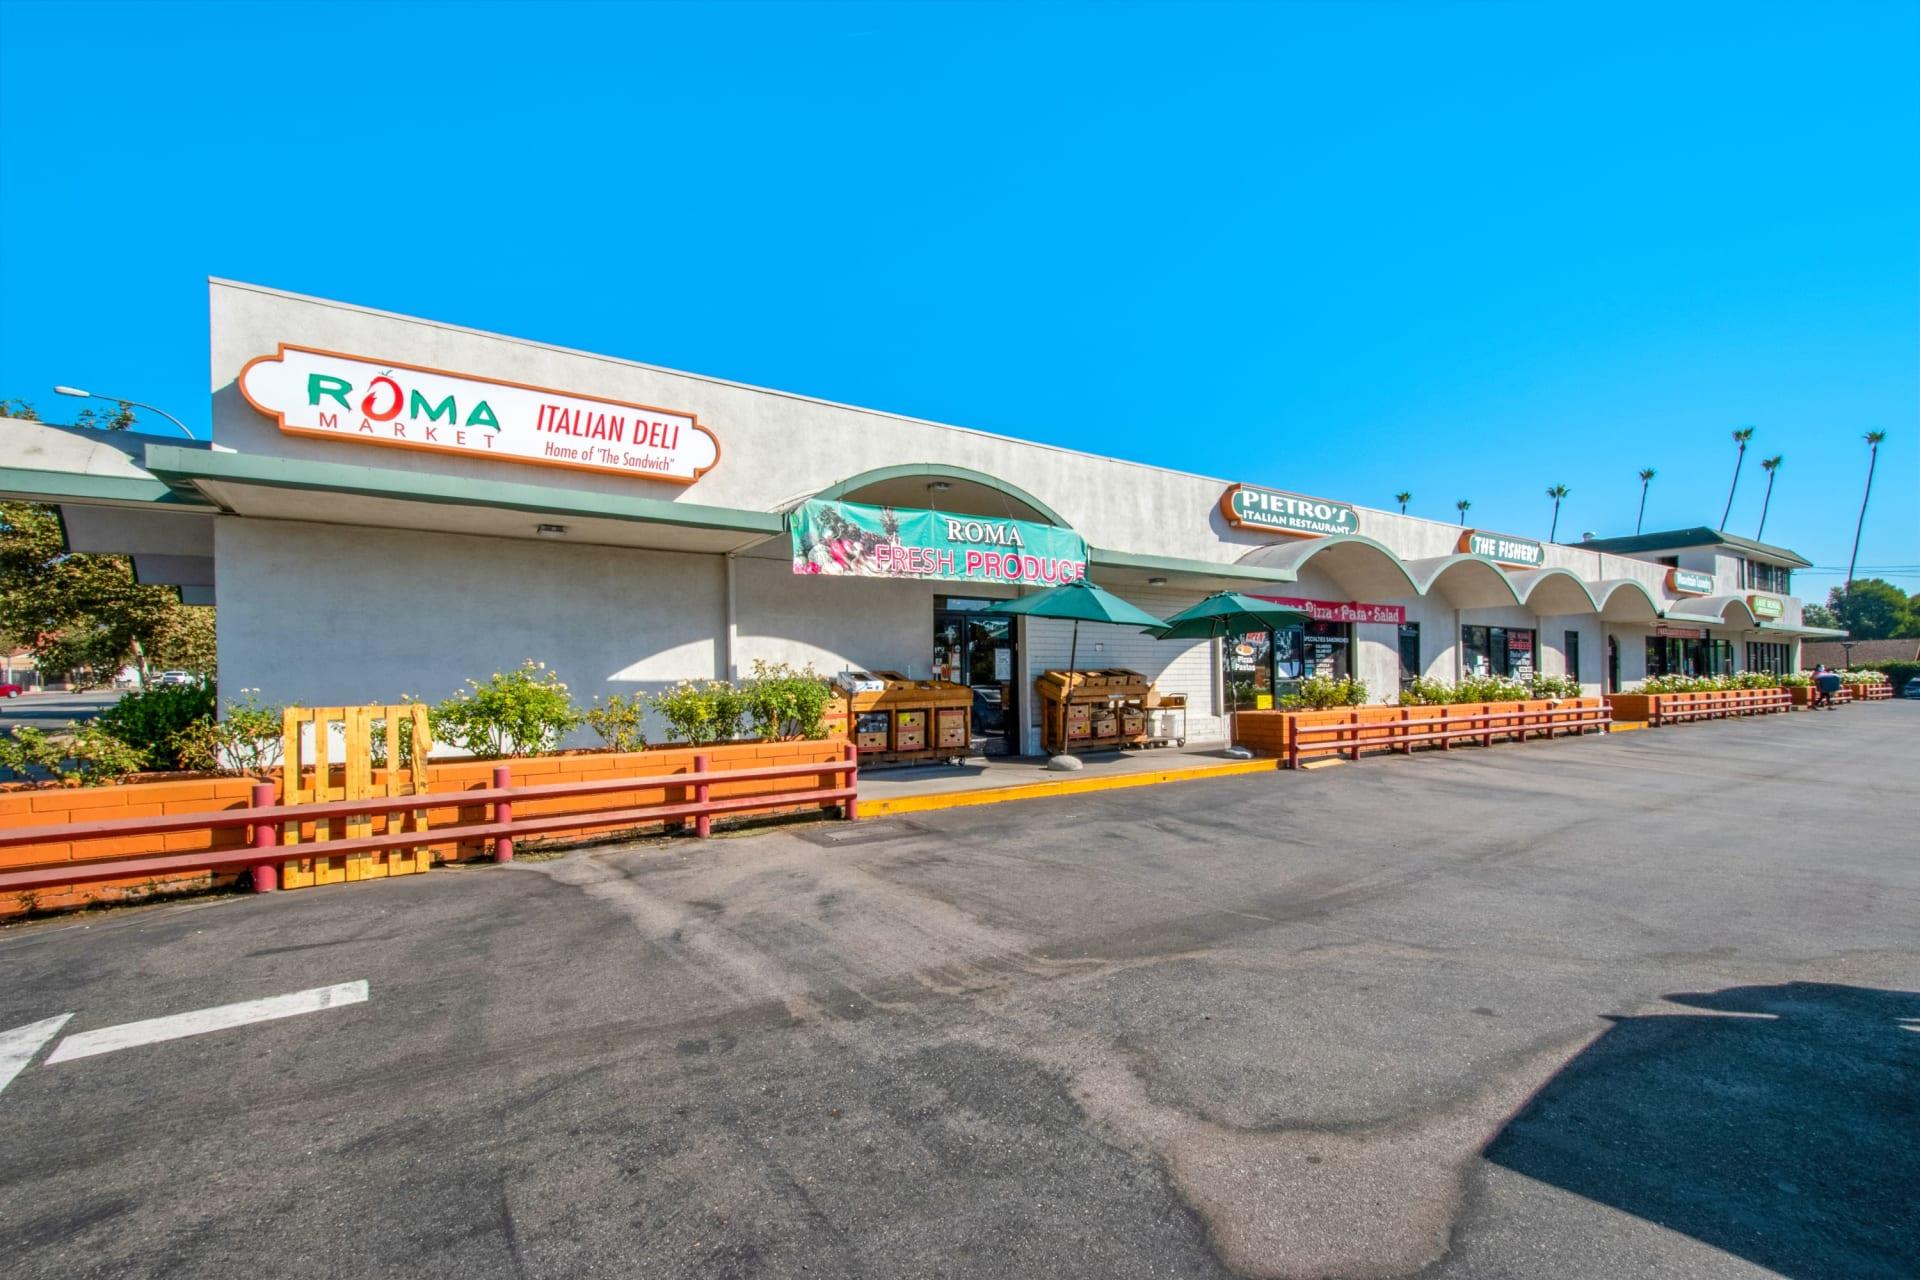 918 N. Lake Ave., Pasadena photo